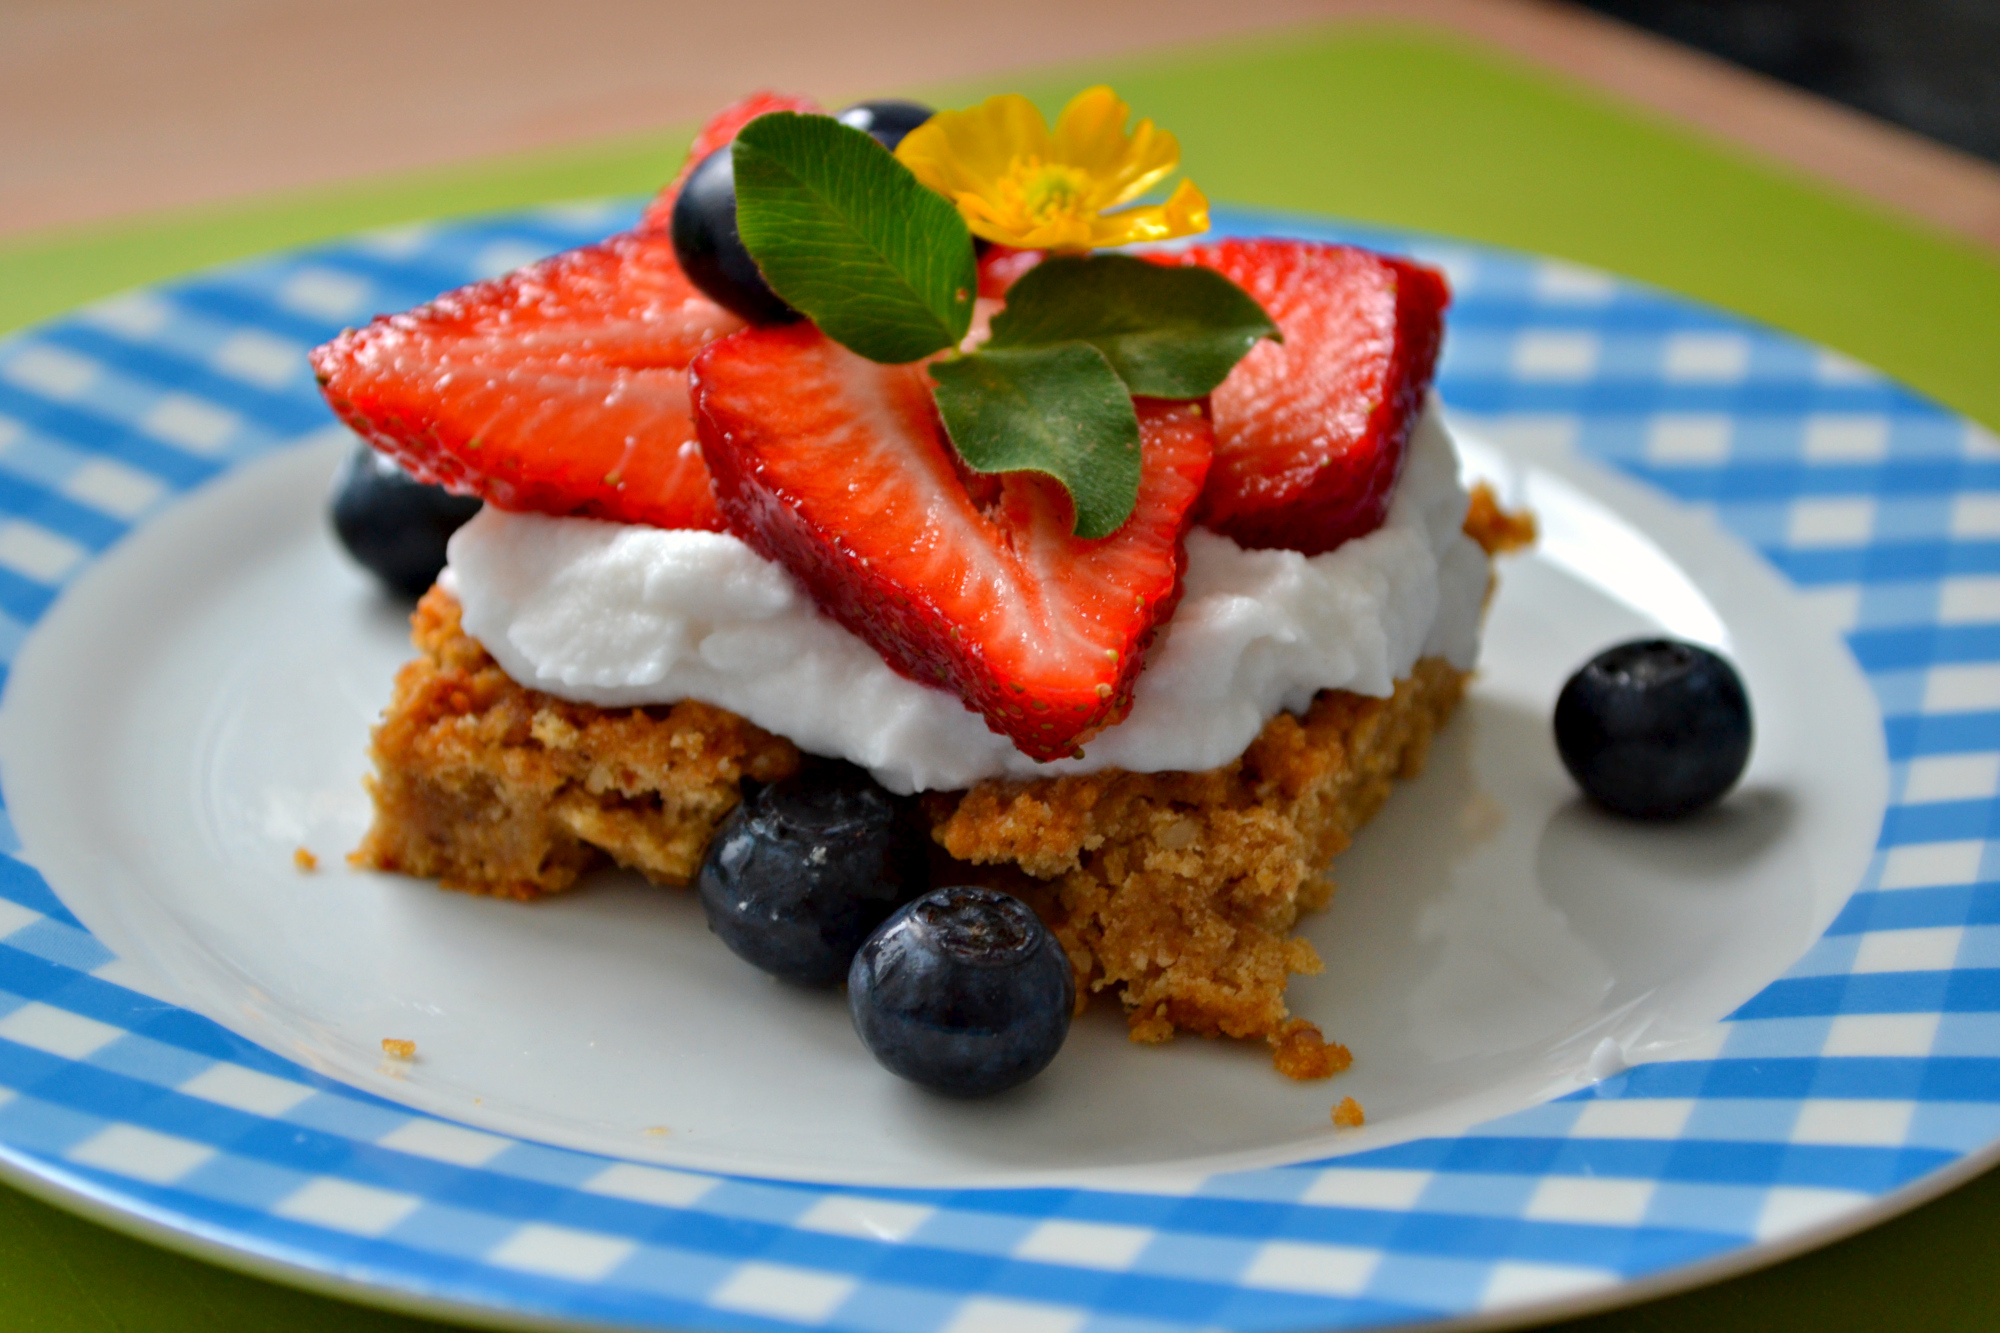 Luxury-Cake Kokossahne mit Erdbeeren